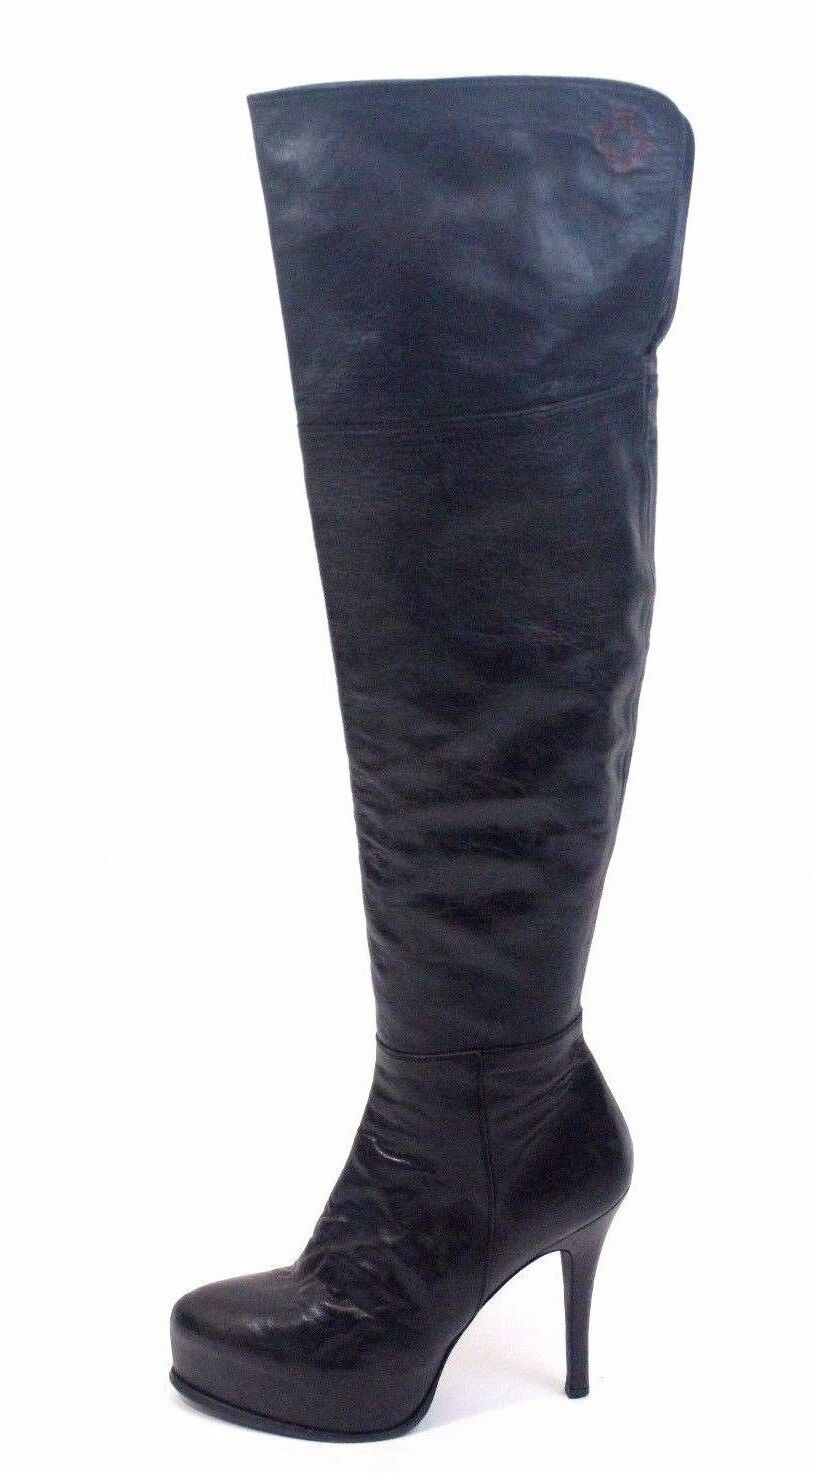 A.F. Vandevorst at Paris Fashion Week  Black Leather Boots Over The Knee Size 40